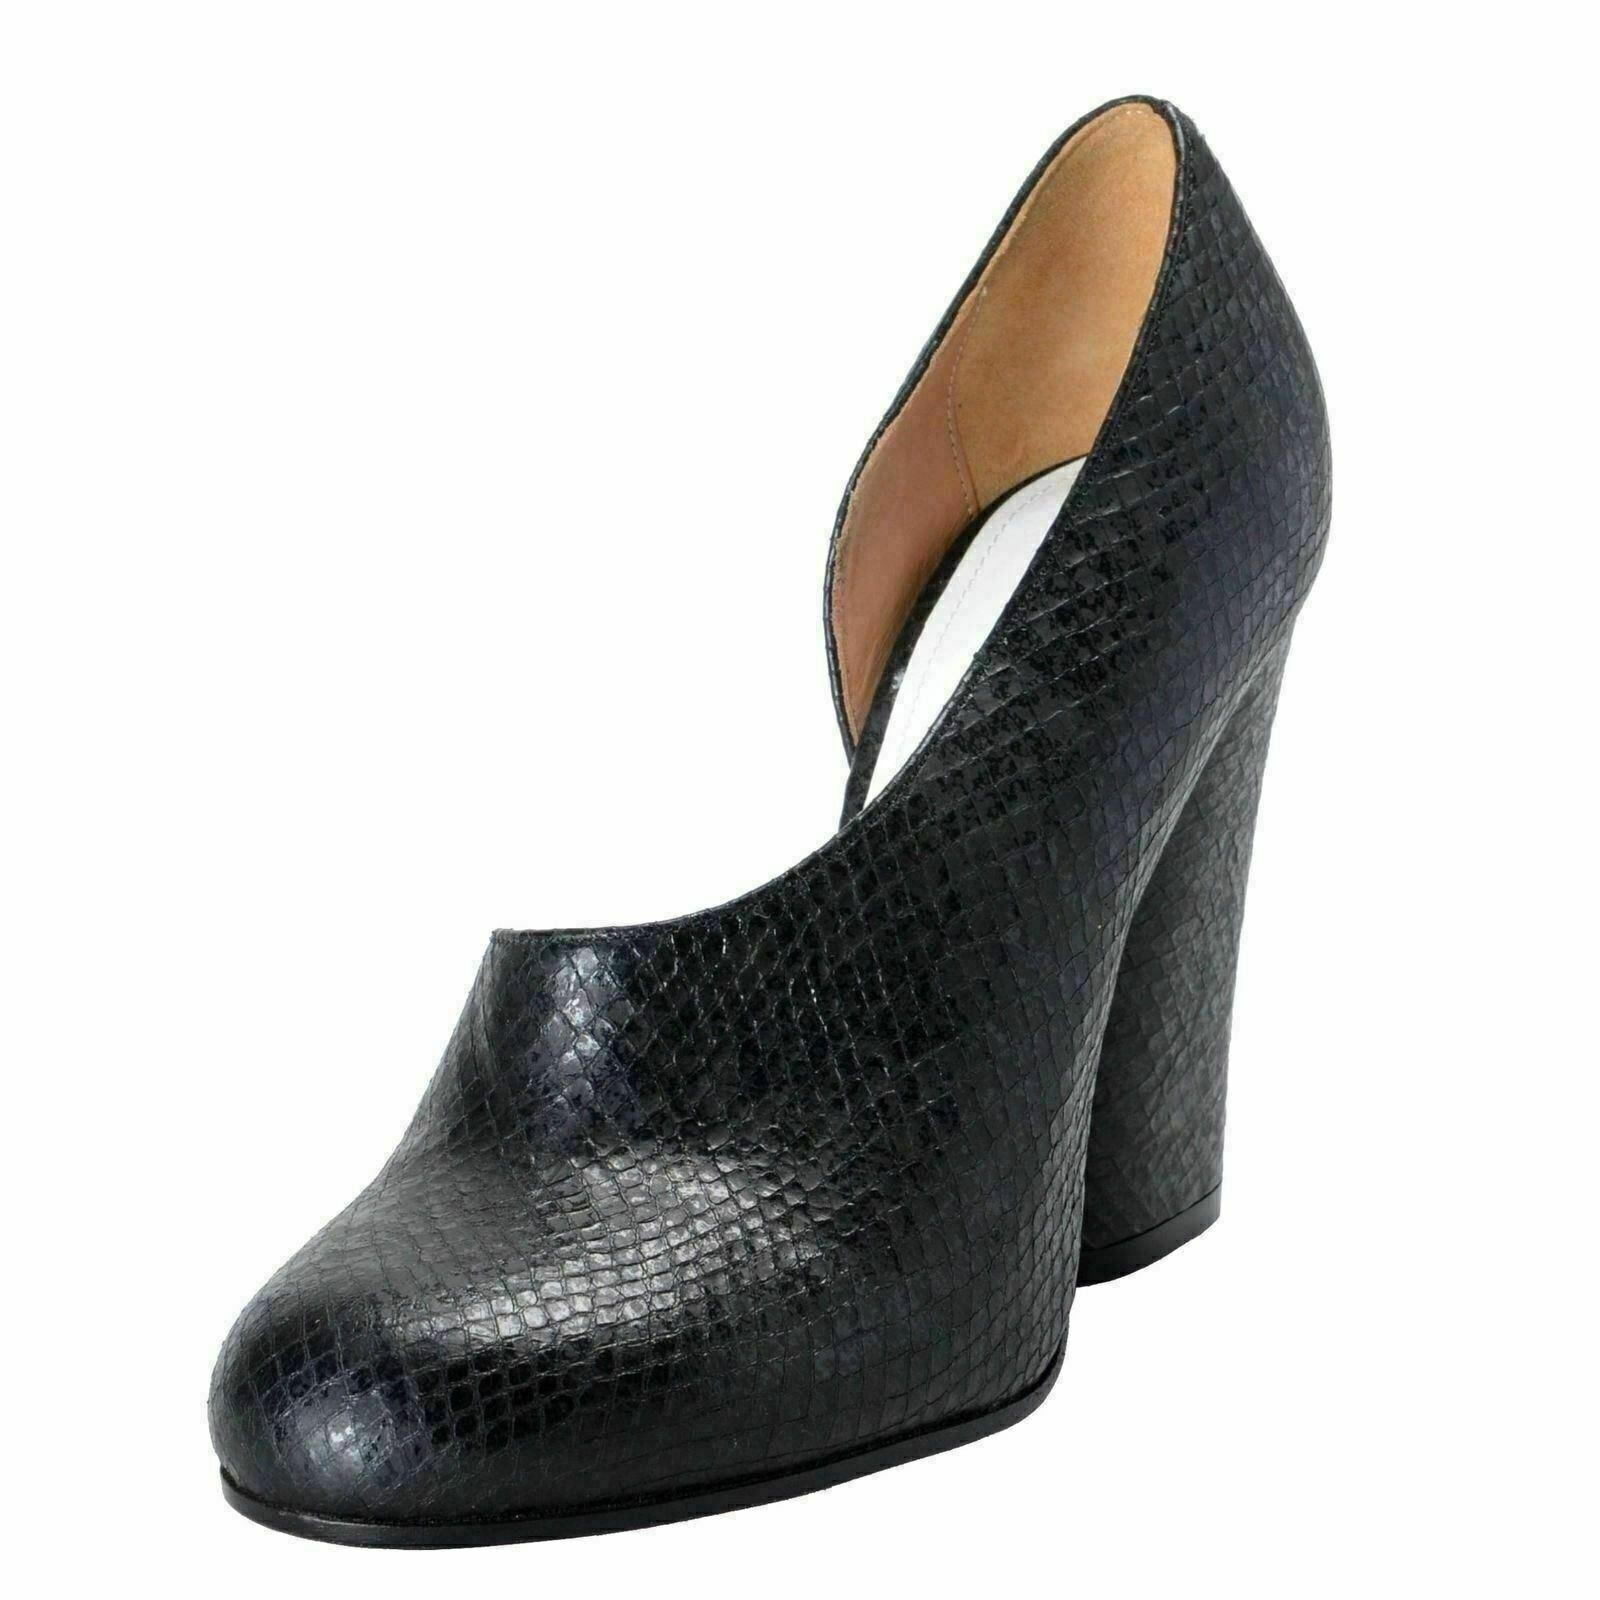 Maison Margiela 22 Women's Snake Print Black Pumps High Heels shoes US 6 IT 37